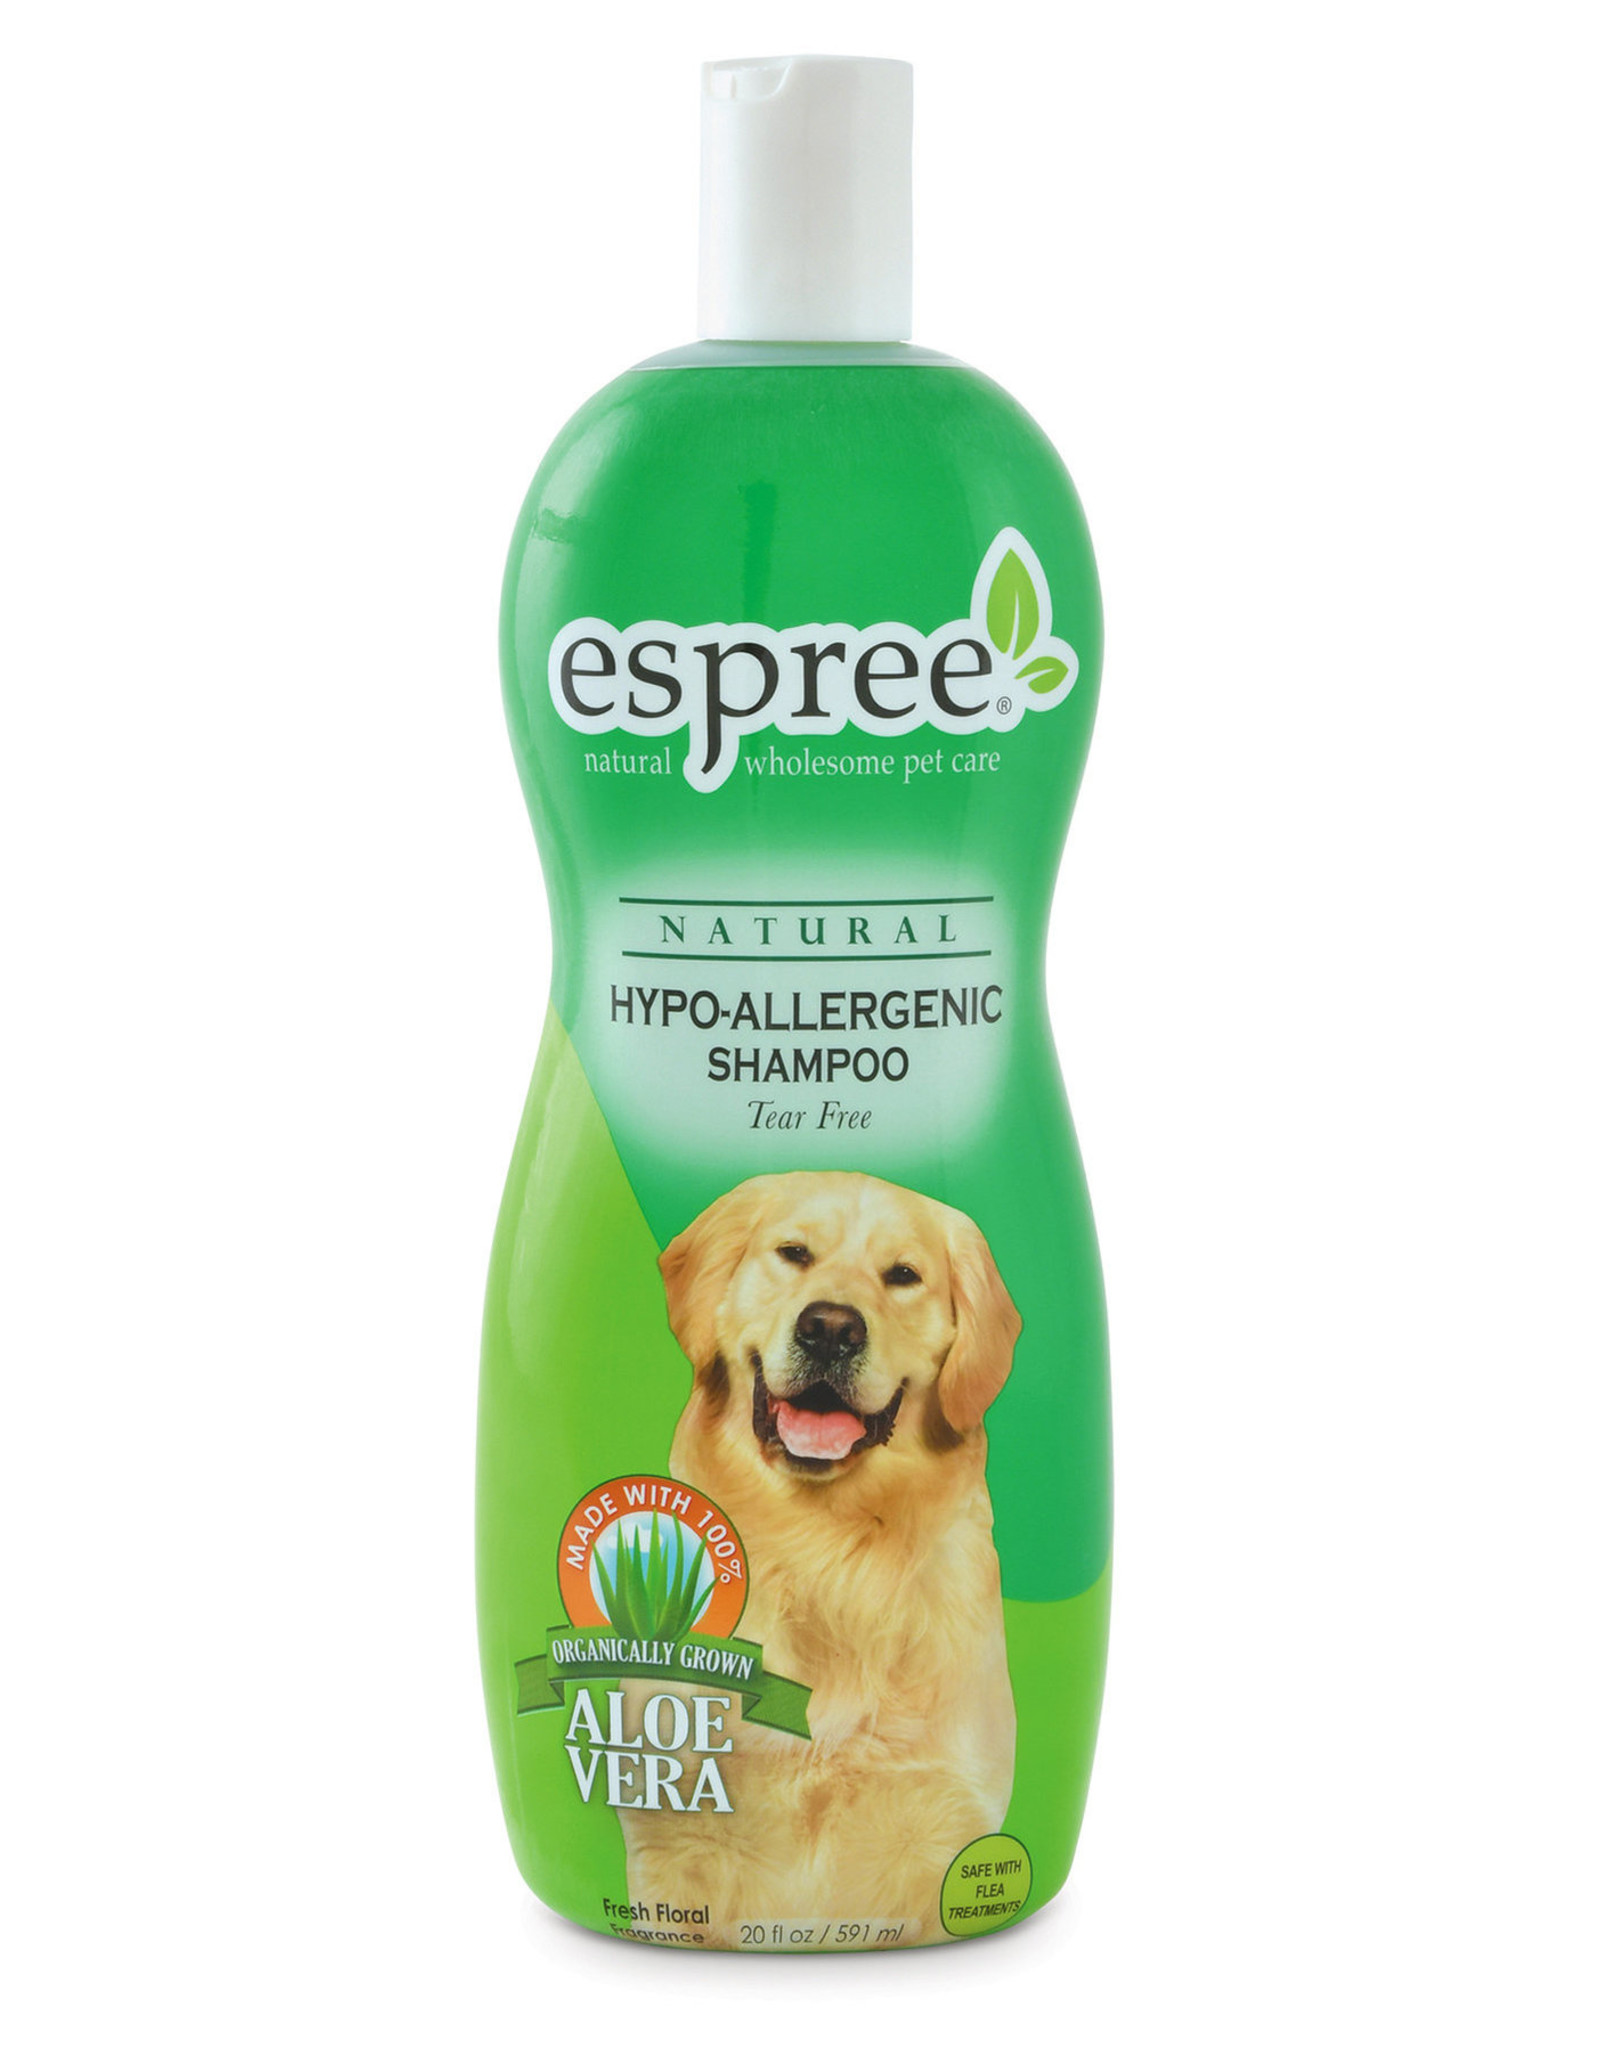 Espree Hypo-Allergenic Shampoo 20oz